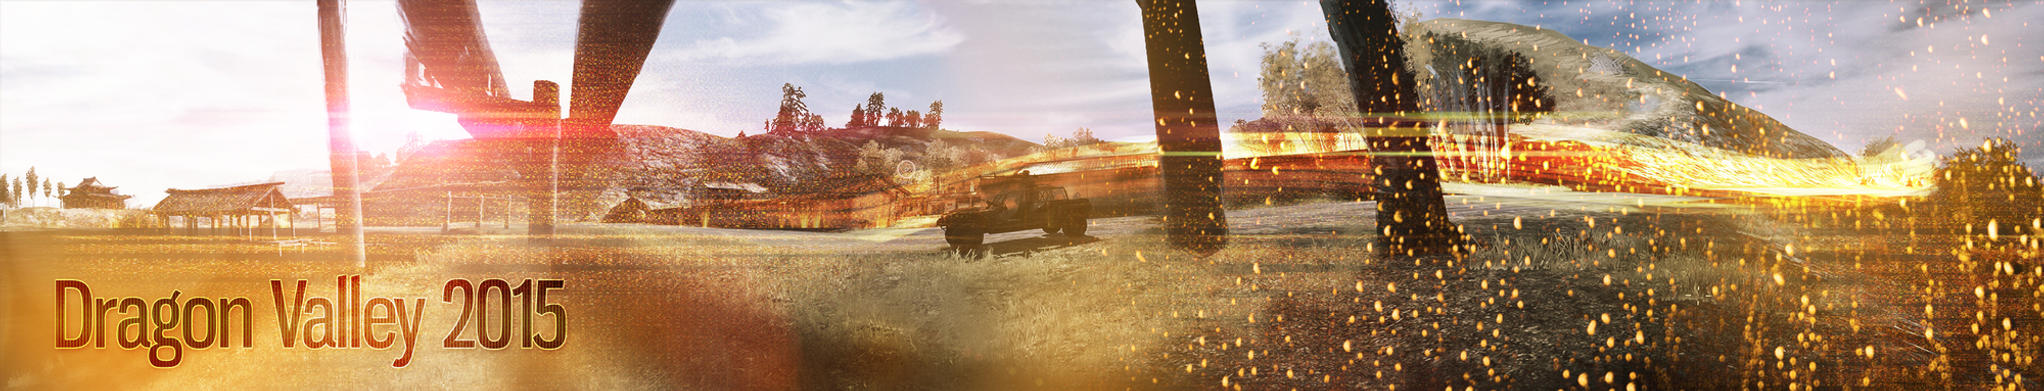 Dragon Valley 2015 by Gamekiller48